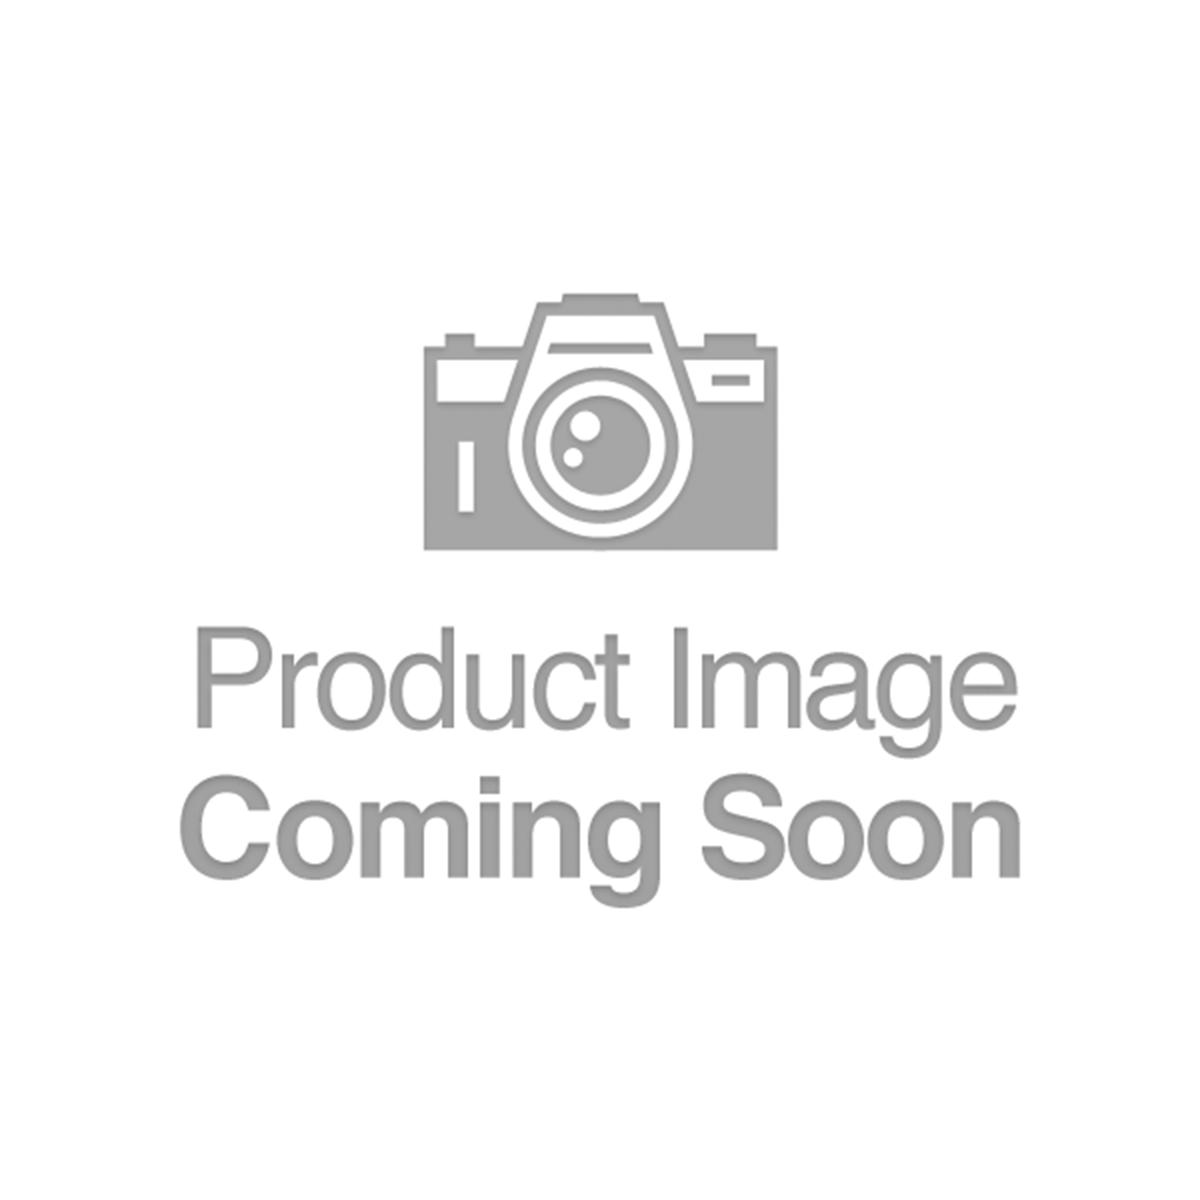 Tazewell - Virginia - CH 6123 - FR 587 - PMG 20